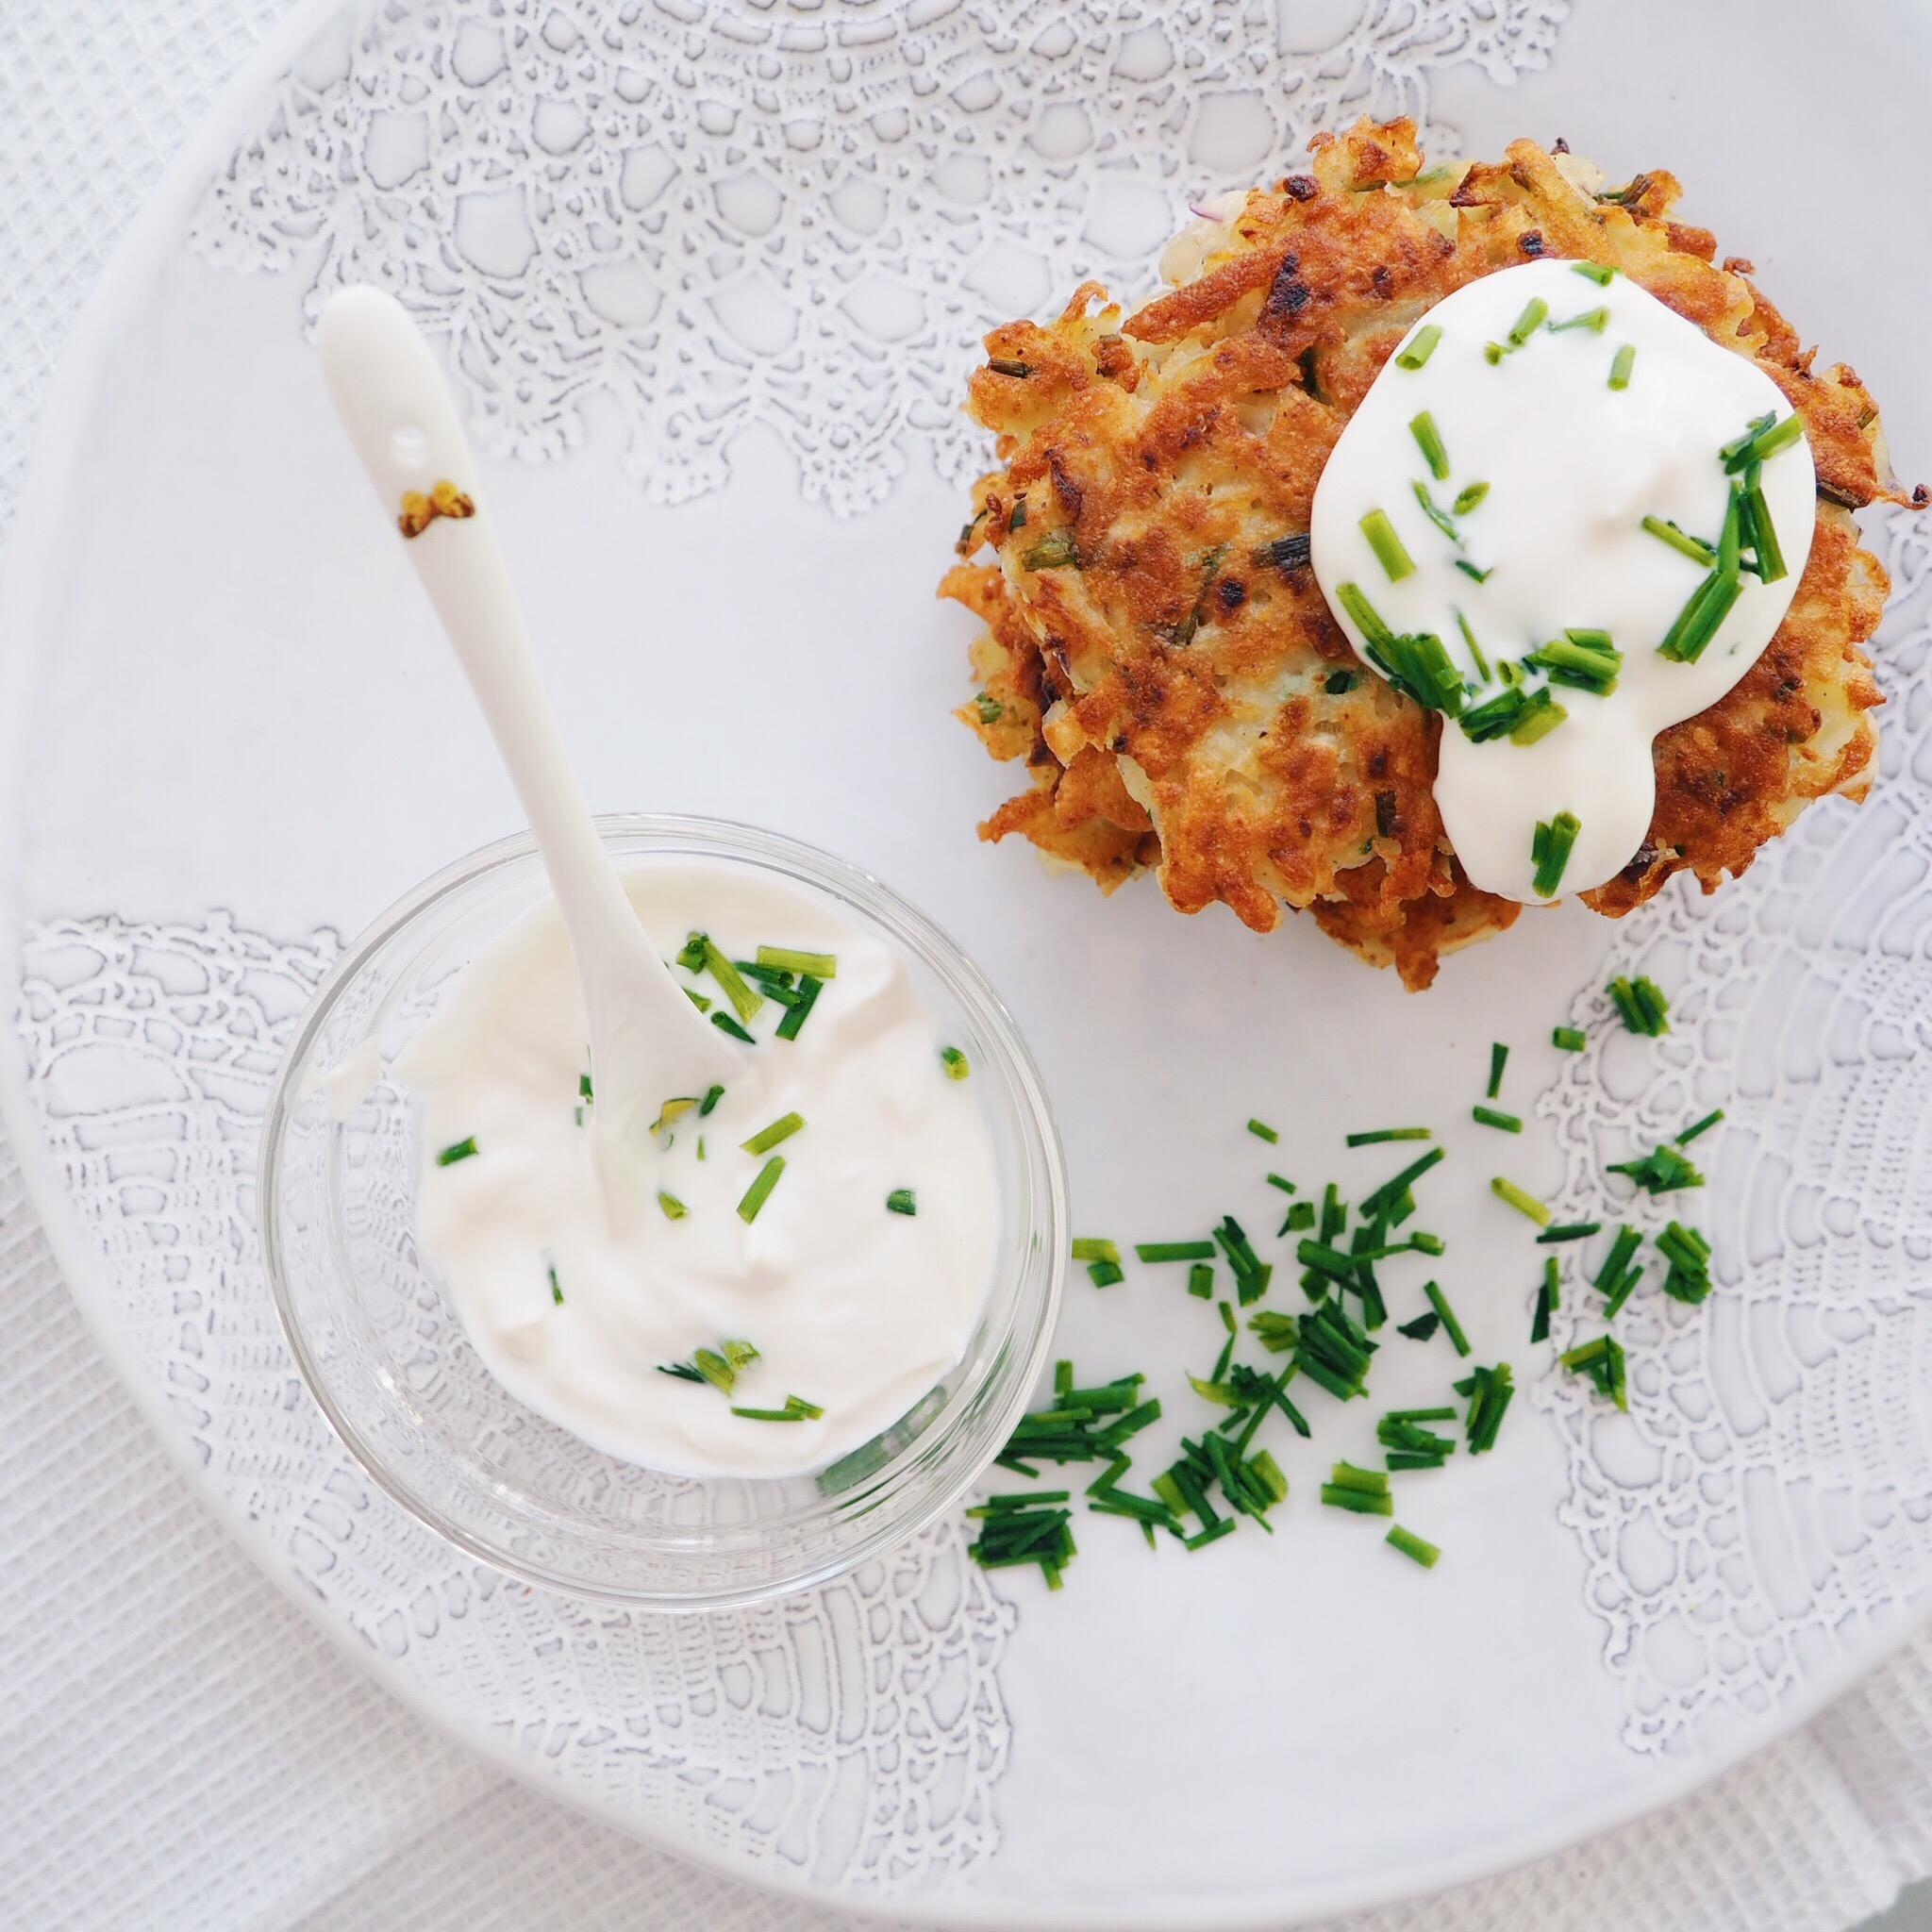 Chive Potato Latke